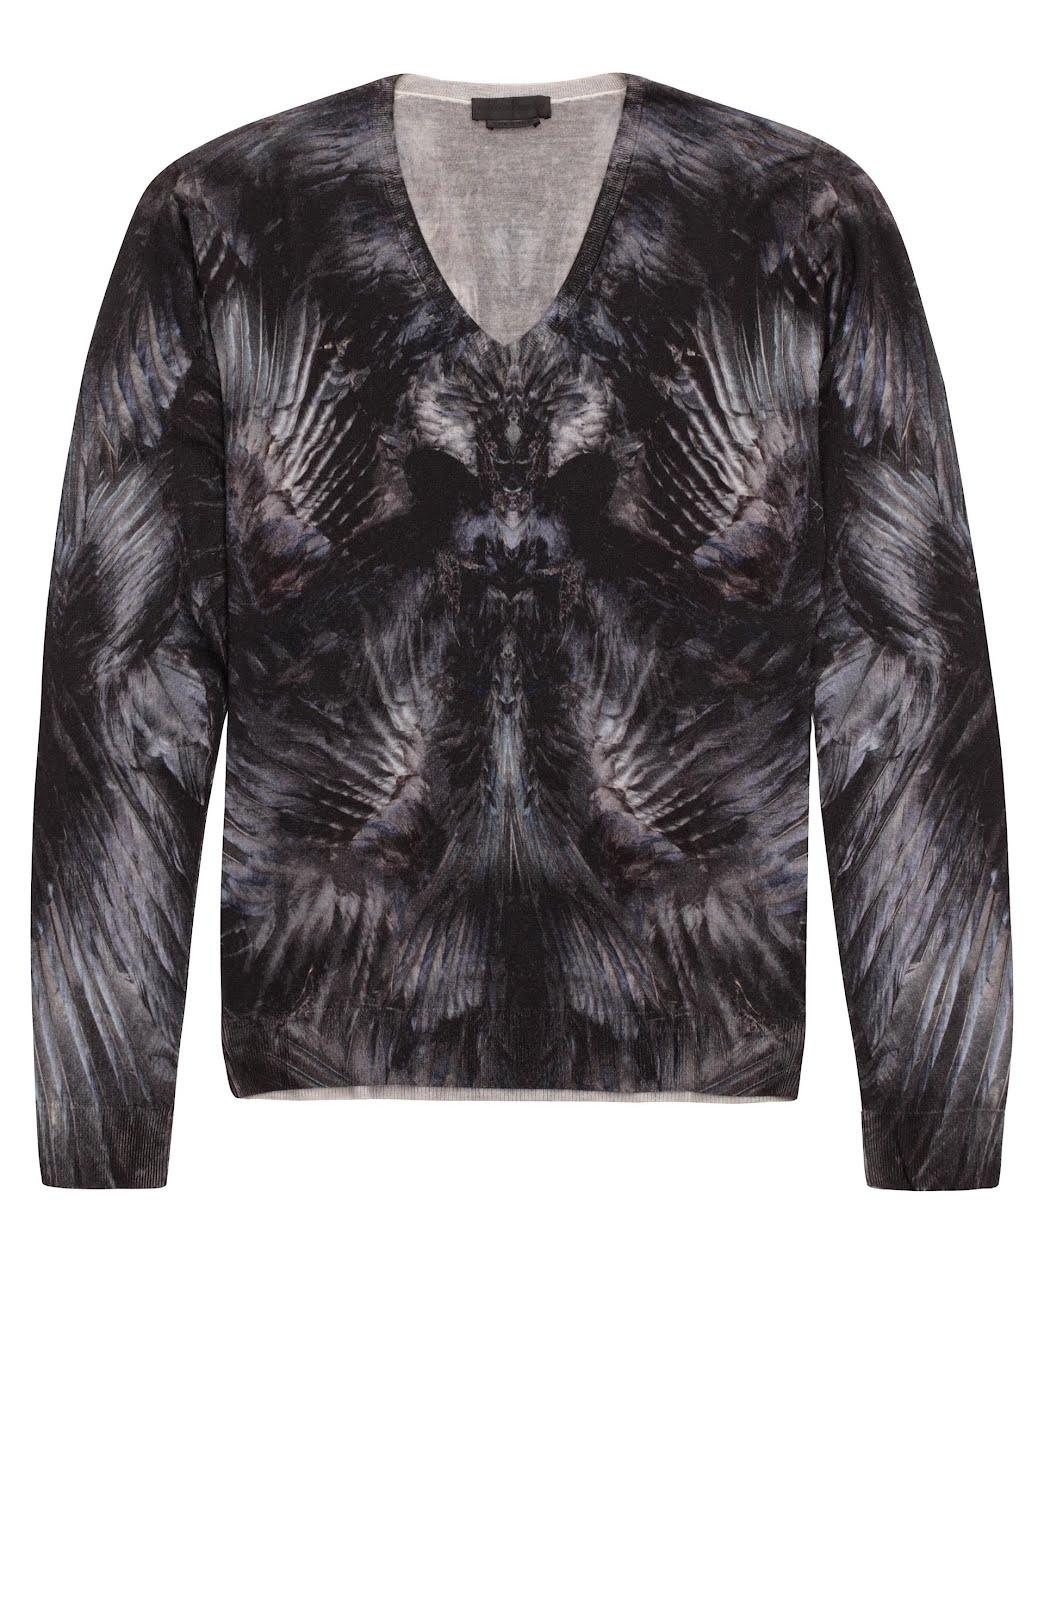 00O00 London Menswear Blog Drake 2012 MTV Video Music Awards Alexander McQueen Raven print sweater